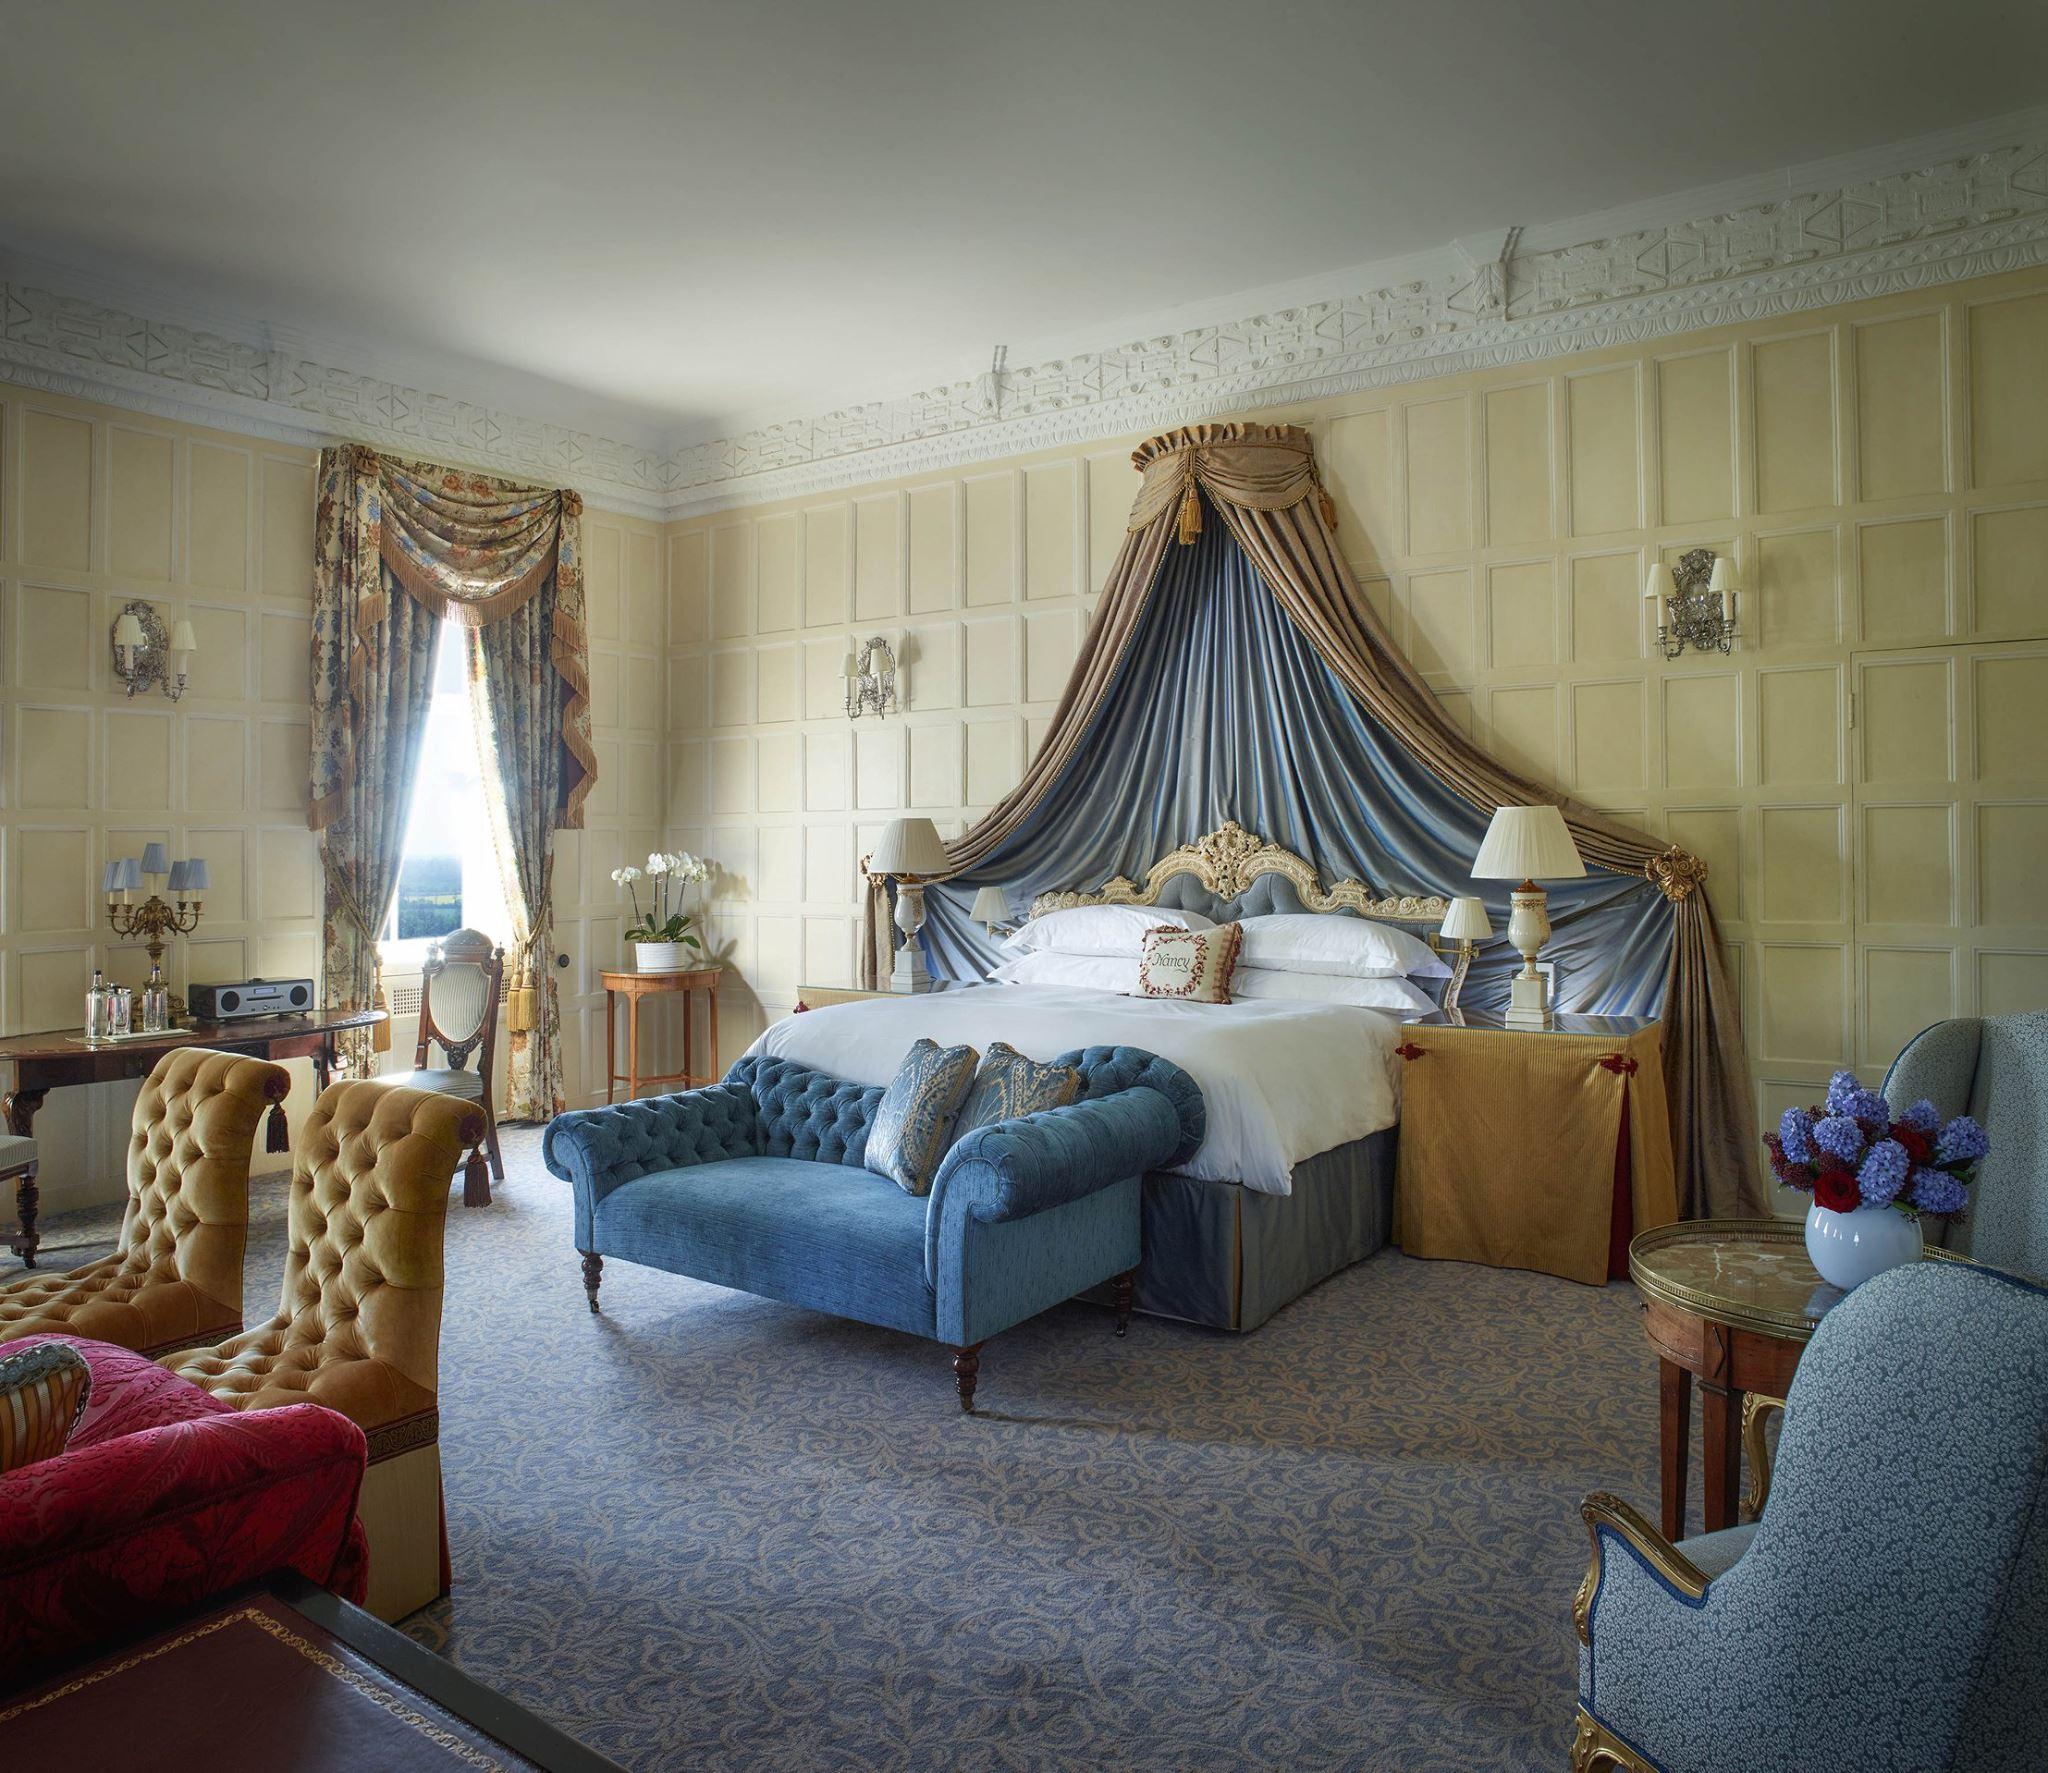 Cliveden house room